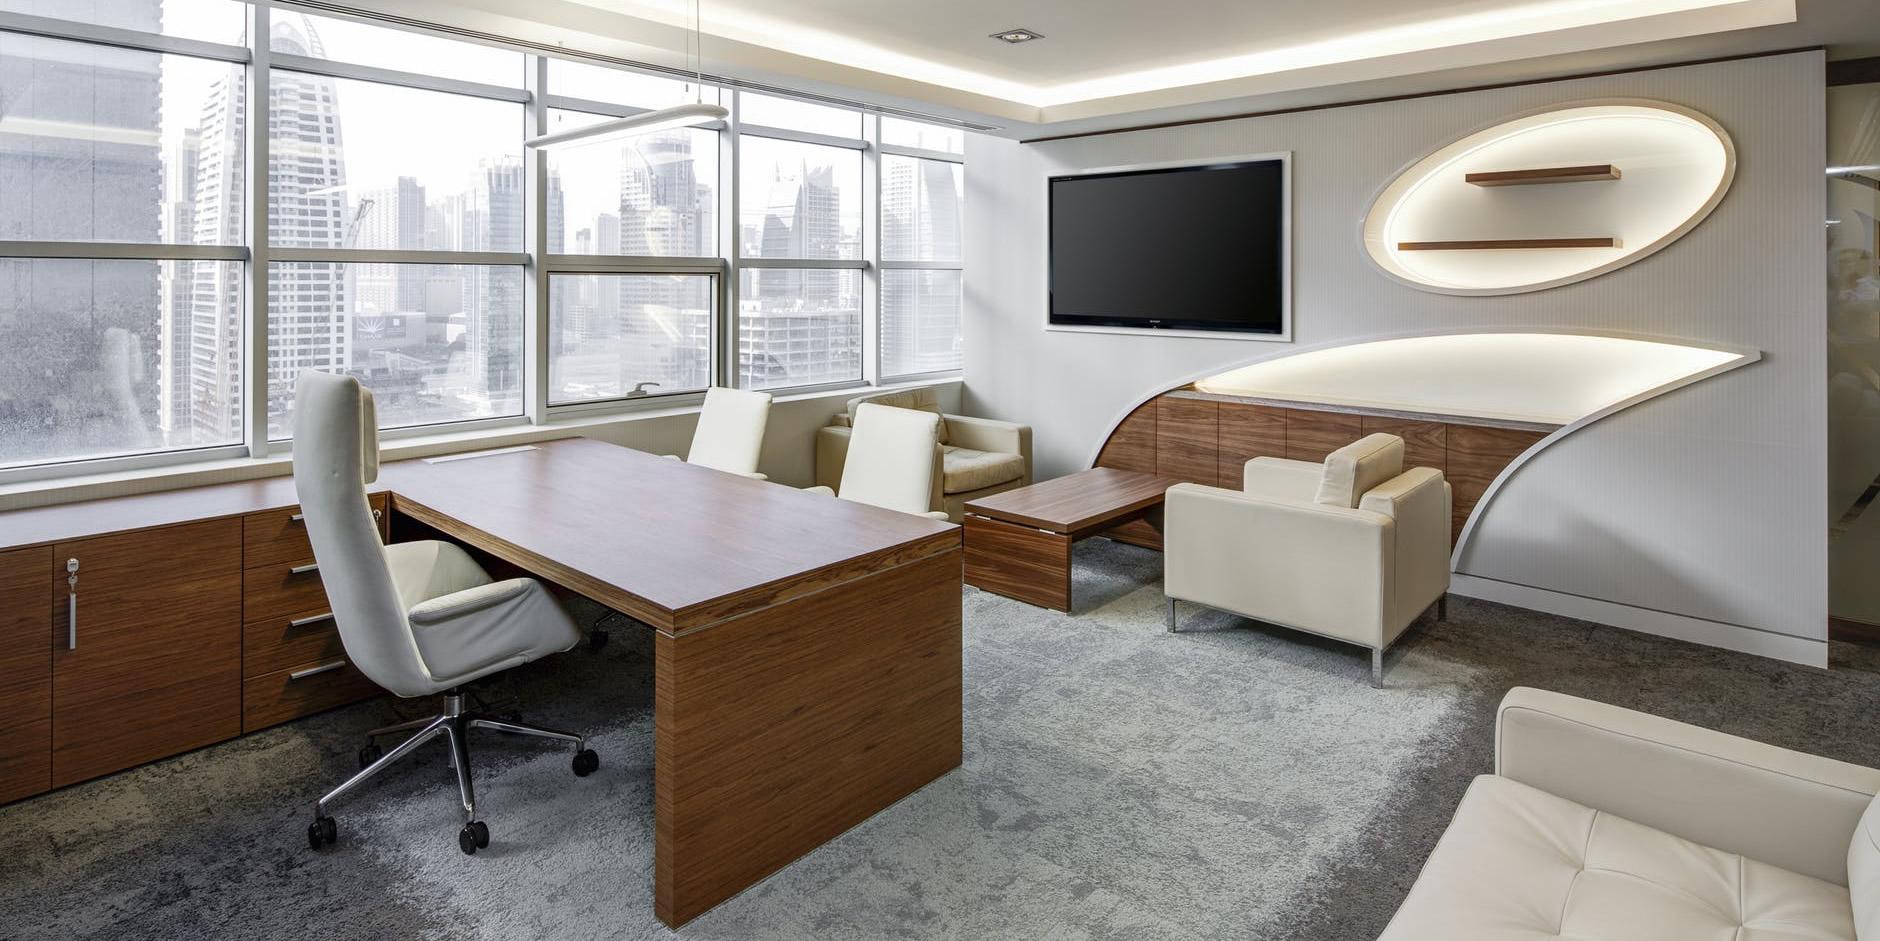 Selecting a Bespoke Furniture Provider